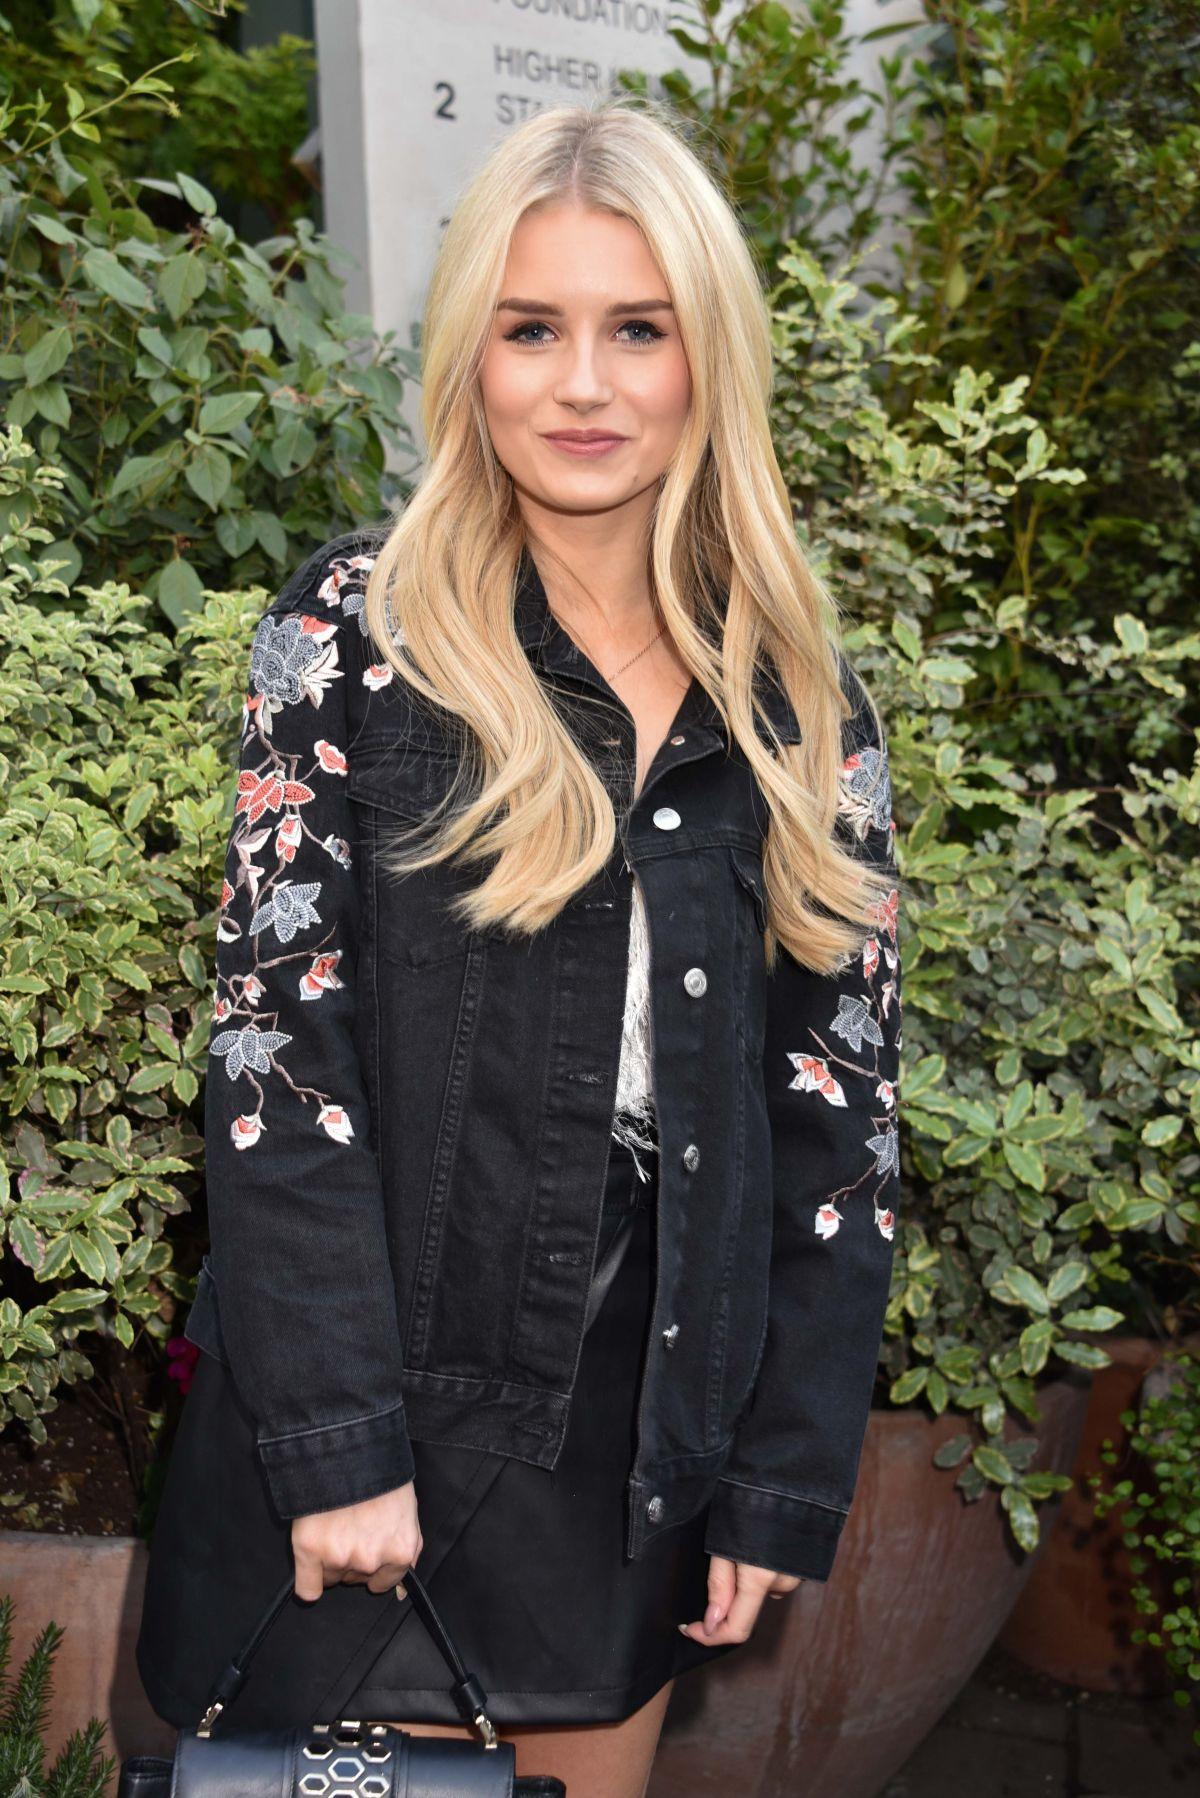 LOTTIE MOSS at Ivy Chelsea Garden Summer Party in London 05/09/2017